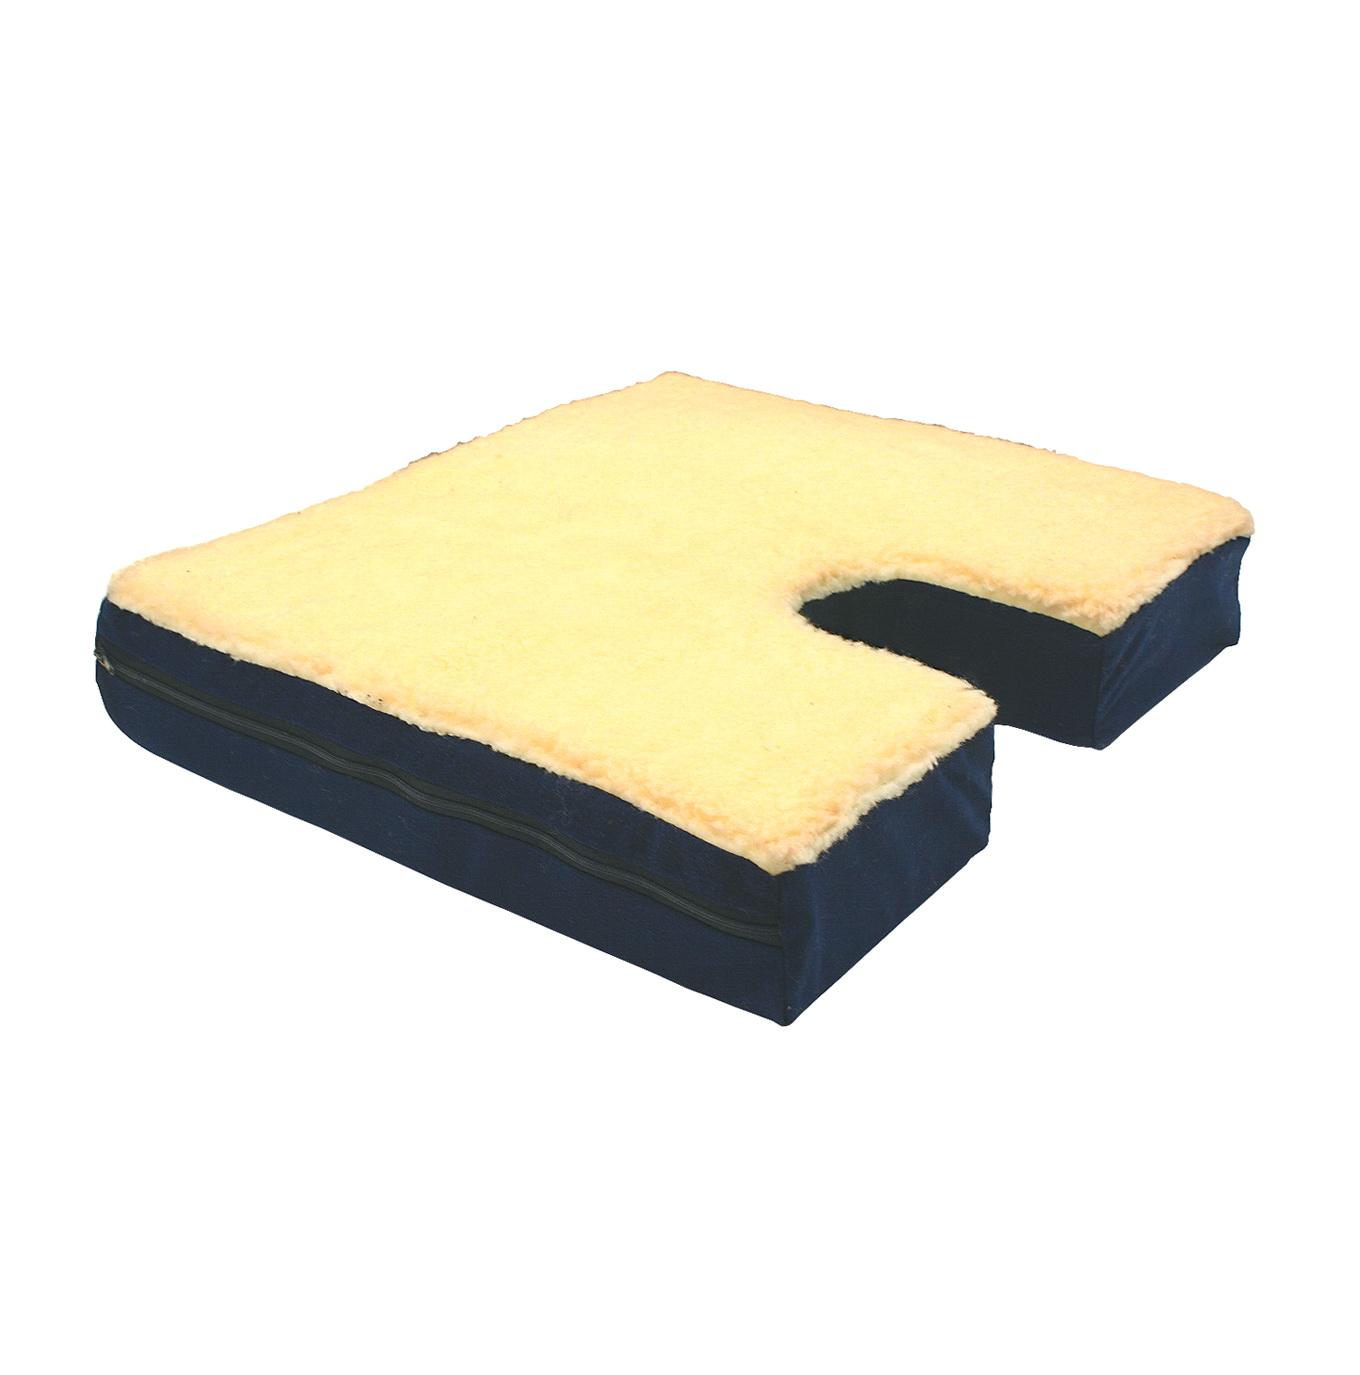 Coccyx Seat Cushion Reviews